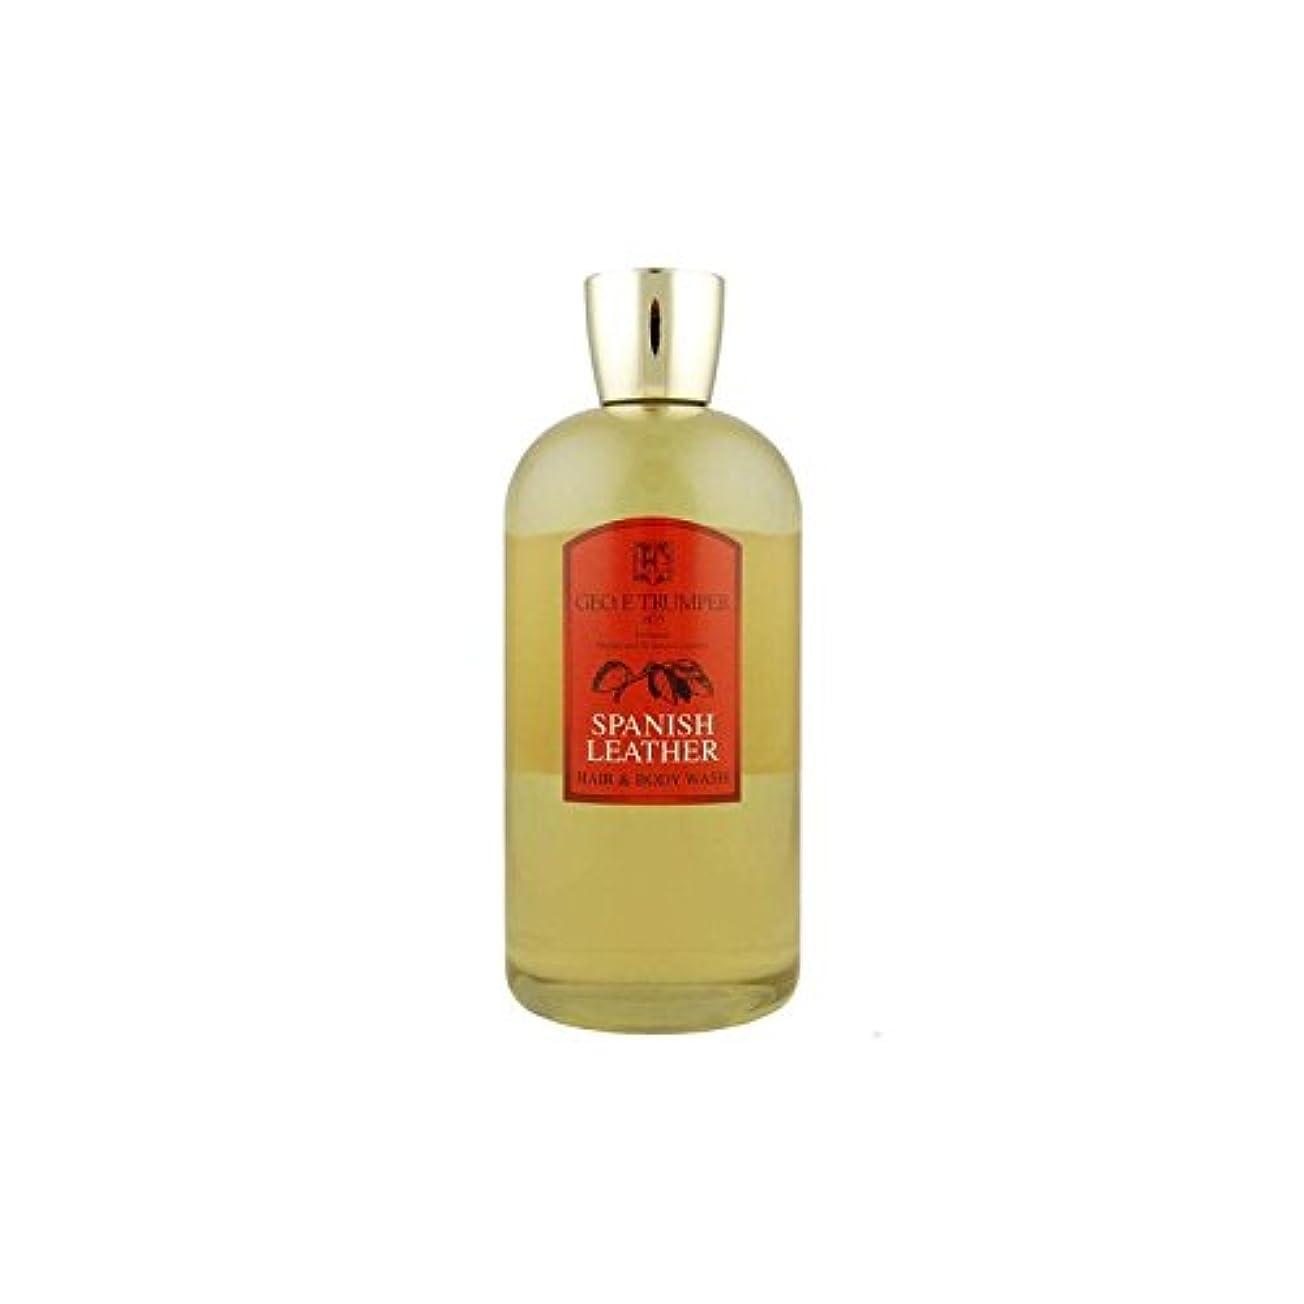 Trumpers Spanish Leather Hair and Body Wash - 500mlTravel Bottle - 革の髪とボディウォッシュスペイン語 - 500ボトル [並行輸入品]